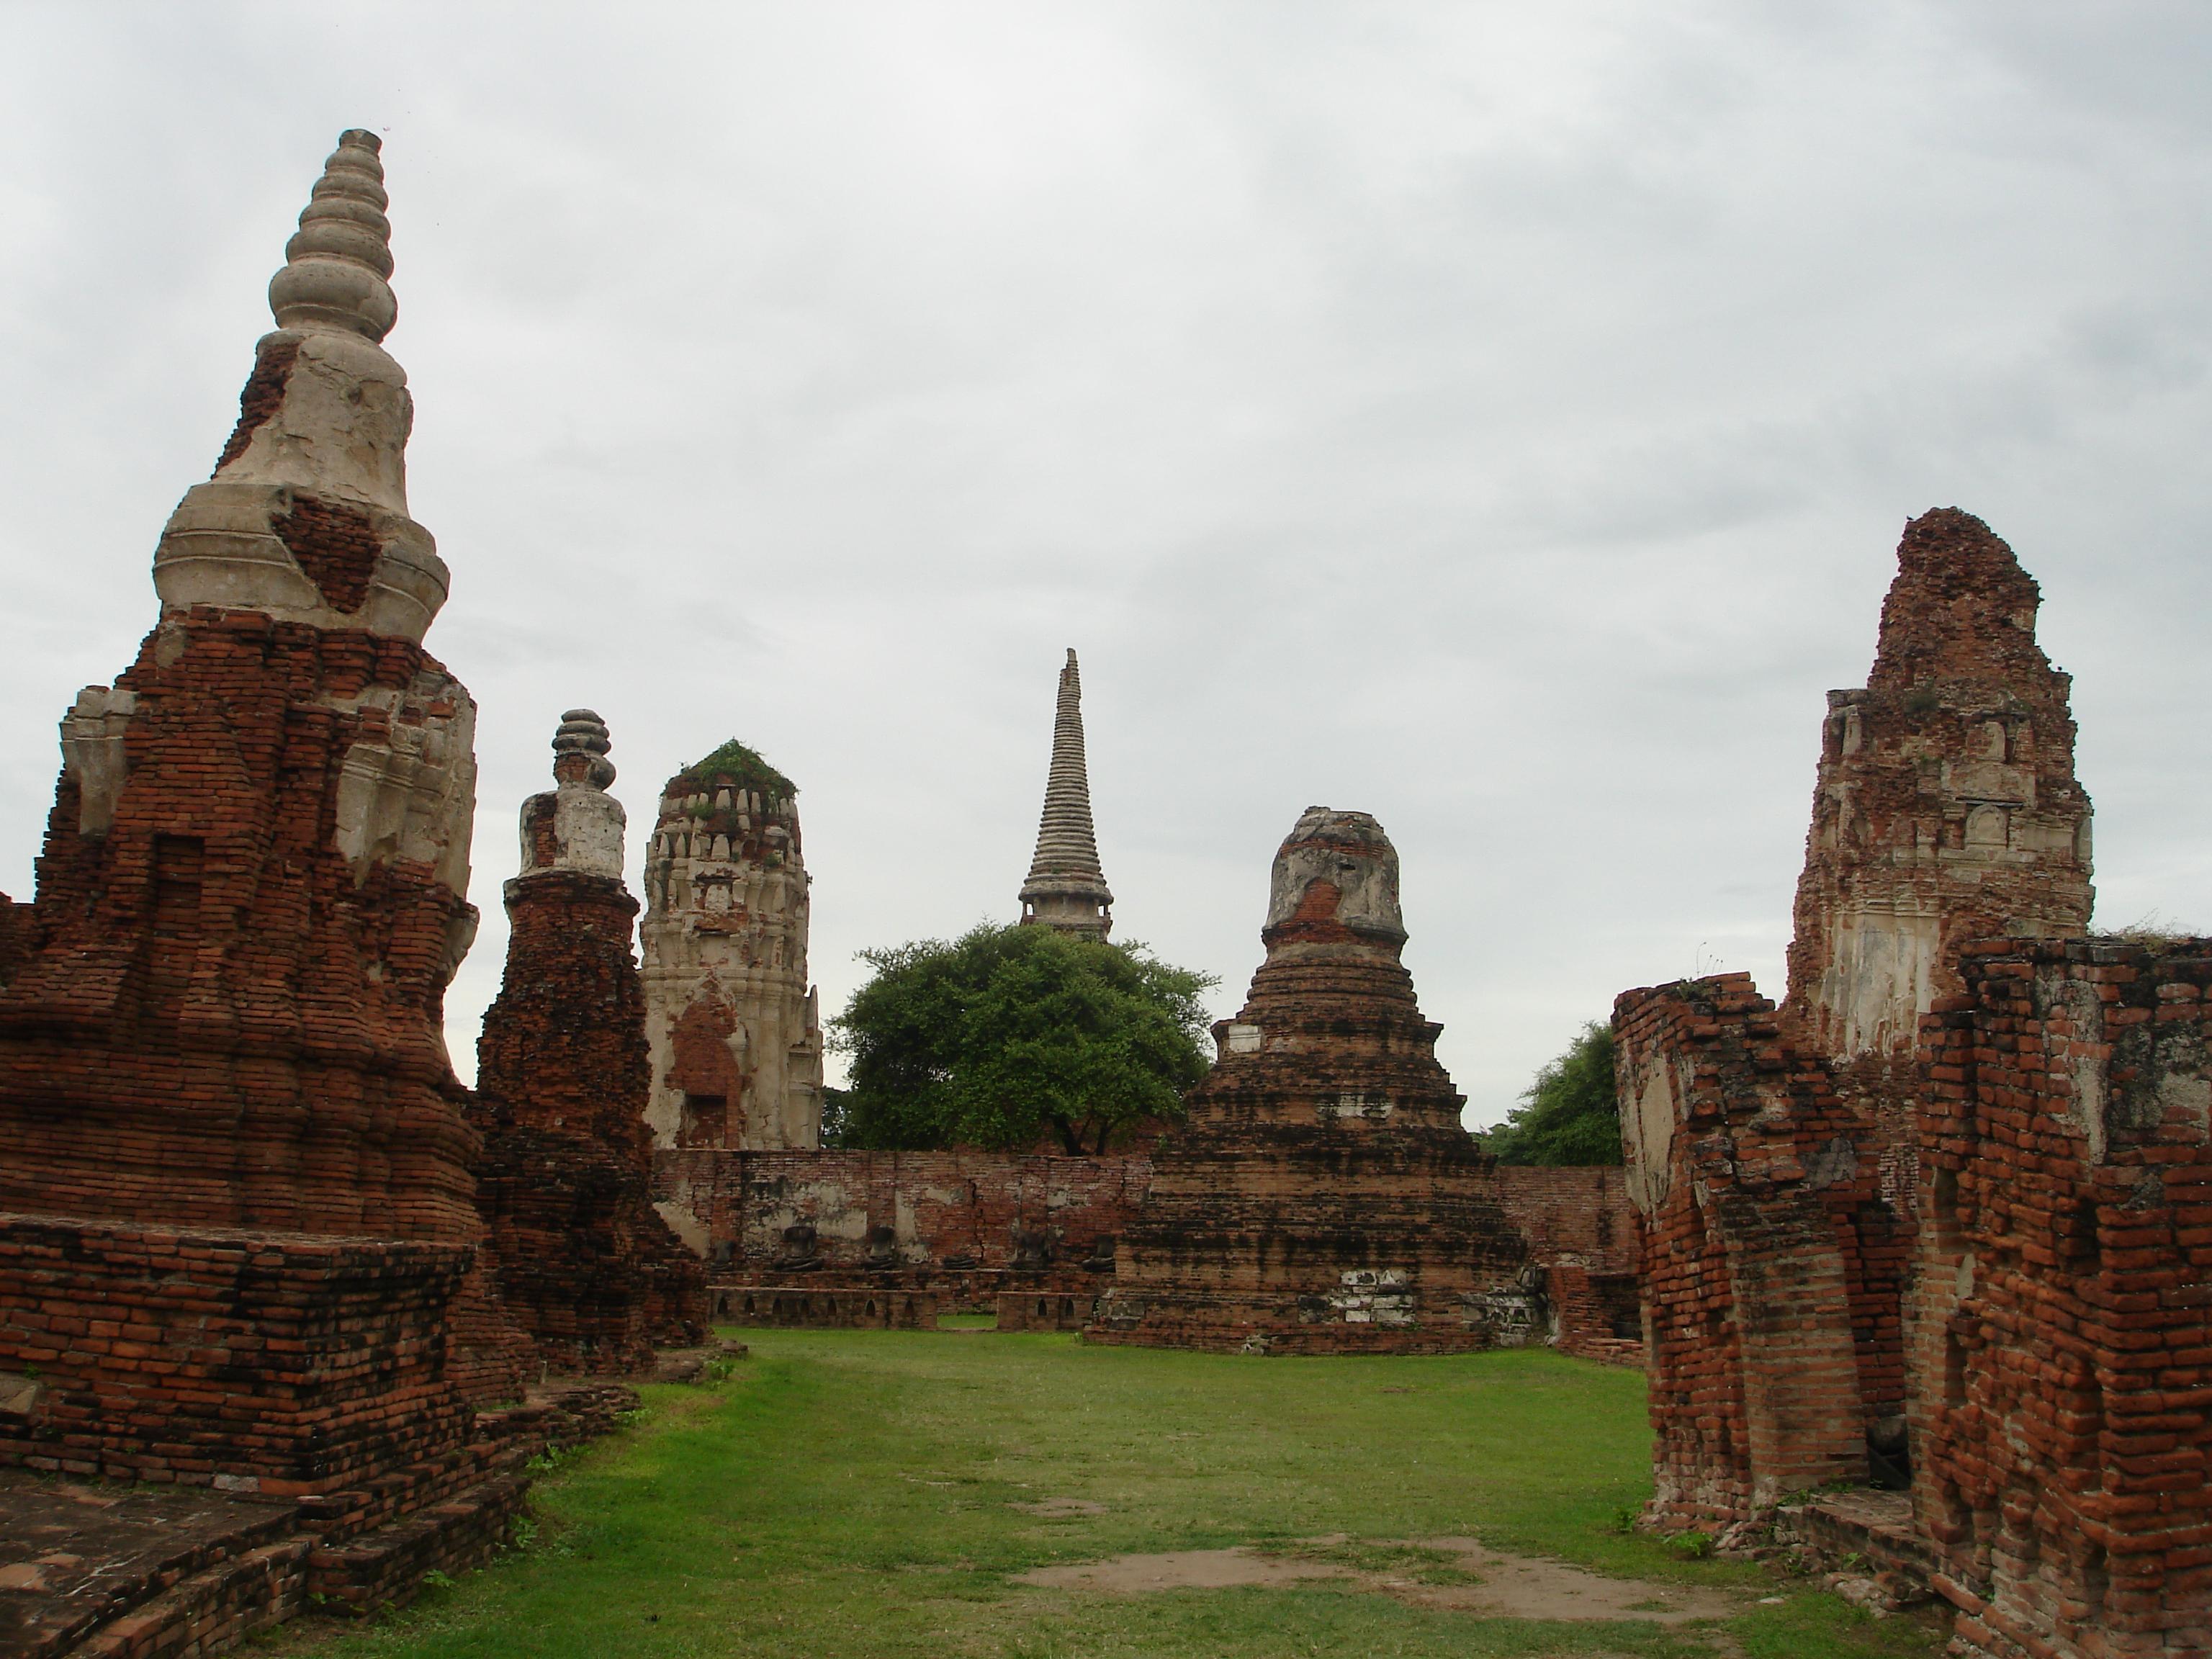 Ruins at Ayutthaya. Photo taken by Mark Jochim on August 3, 2006.